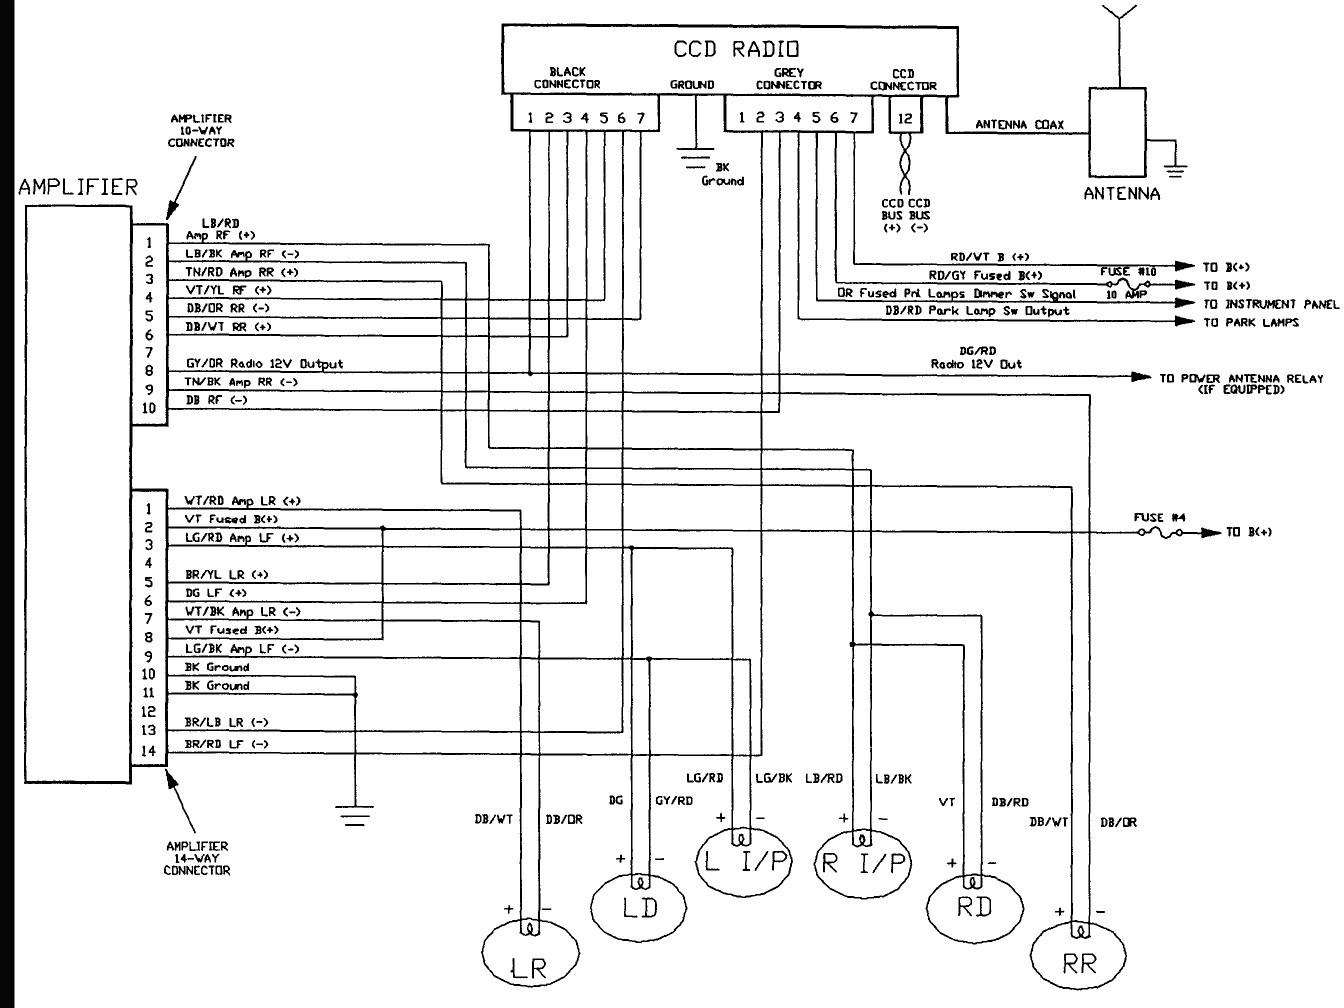 2012 jeep liberty radio wiring diagram stereo 5 natebird me rh natebird me 2004 Jeep Grand Cherokee Radio Wiring Diagram 1995 Jeep Grand Cherokee Radio